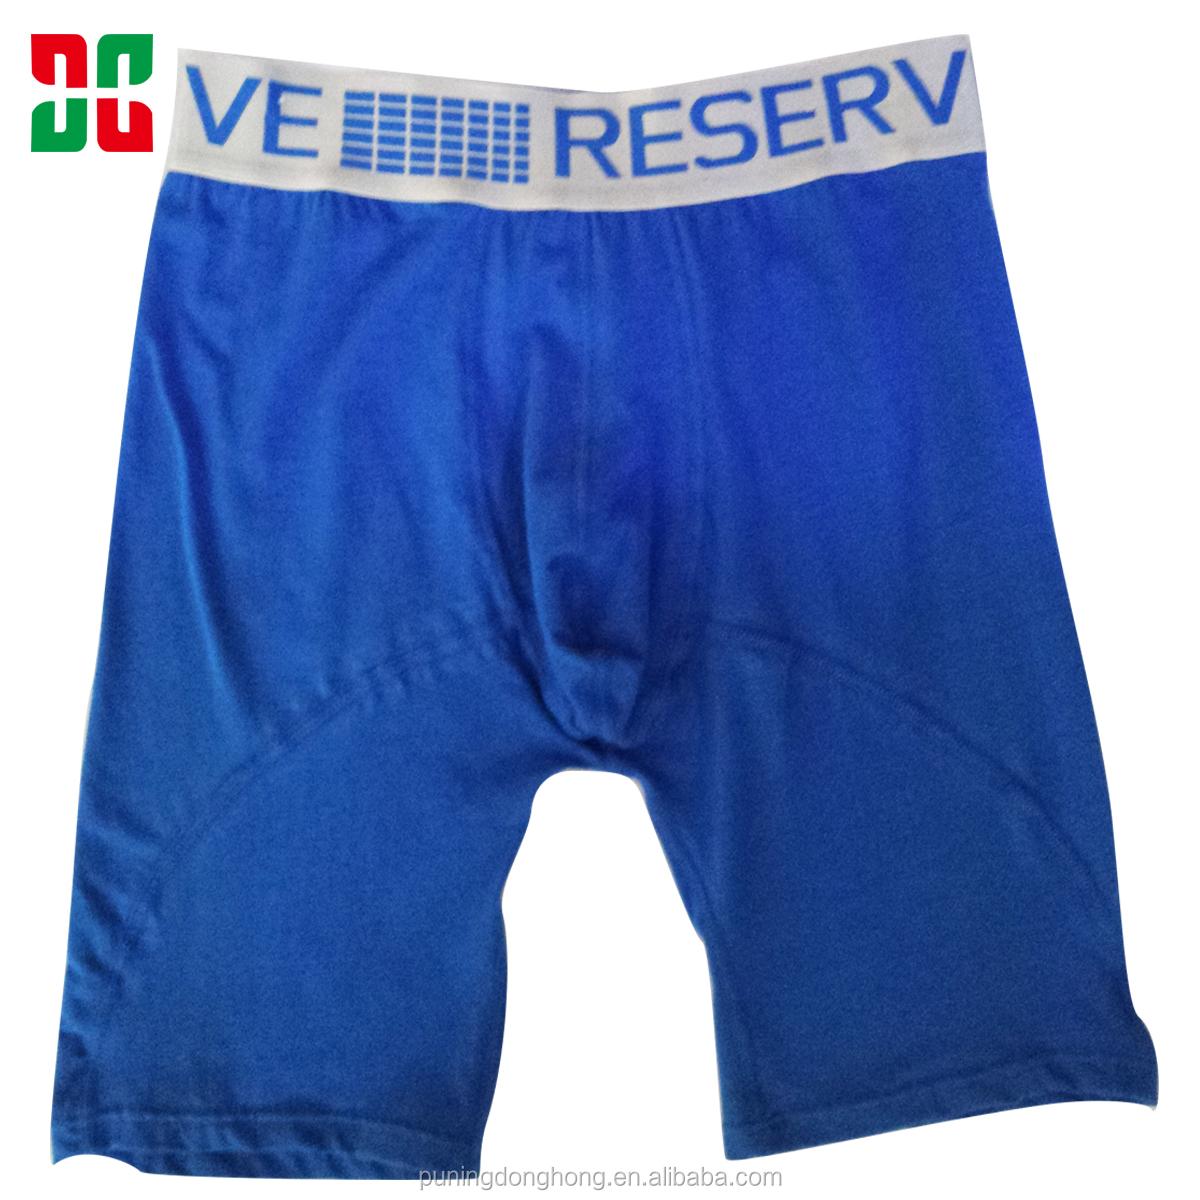 7ae678856d39 Oem No Rise Up Long Mans Jockey Underwear Man Brand - Buy ...